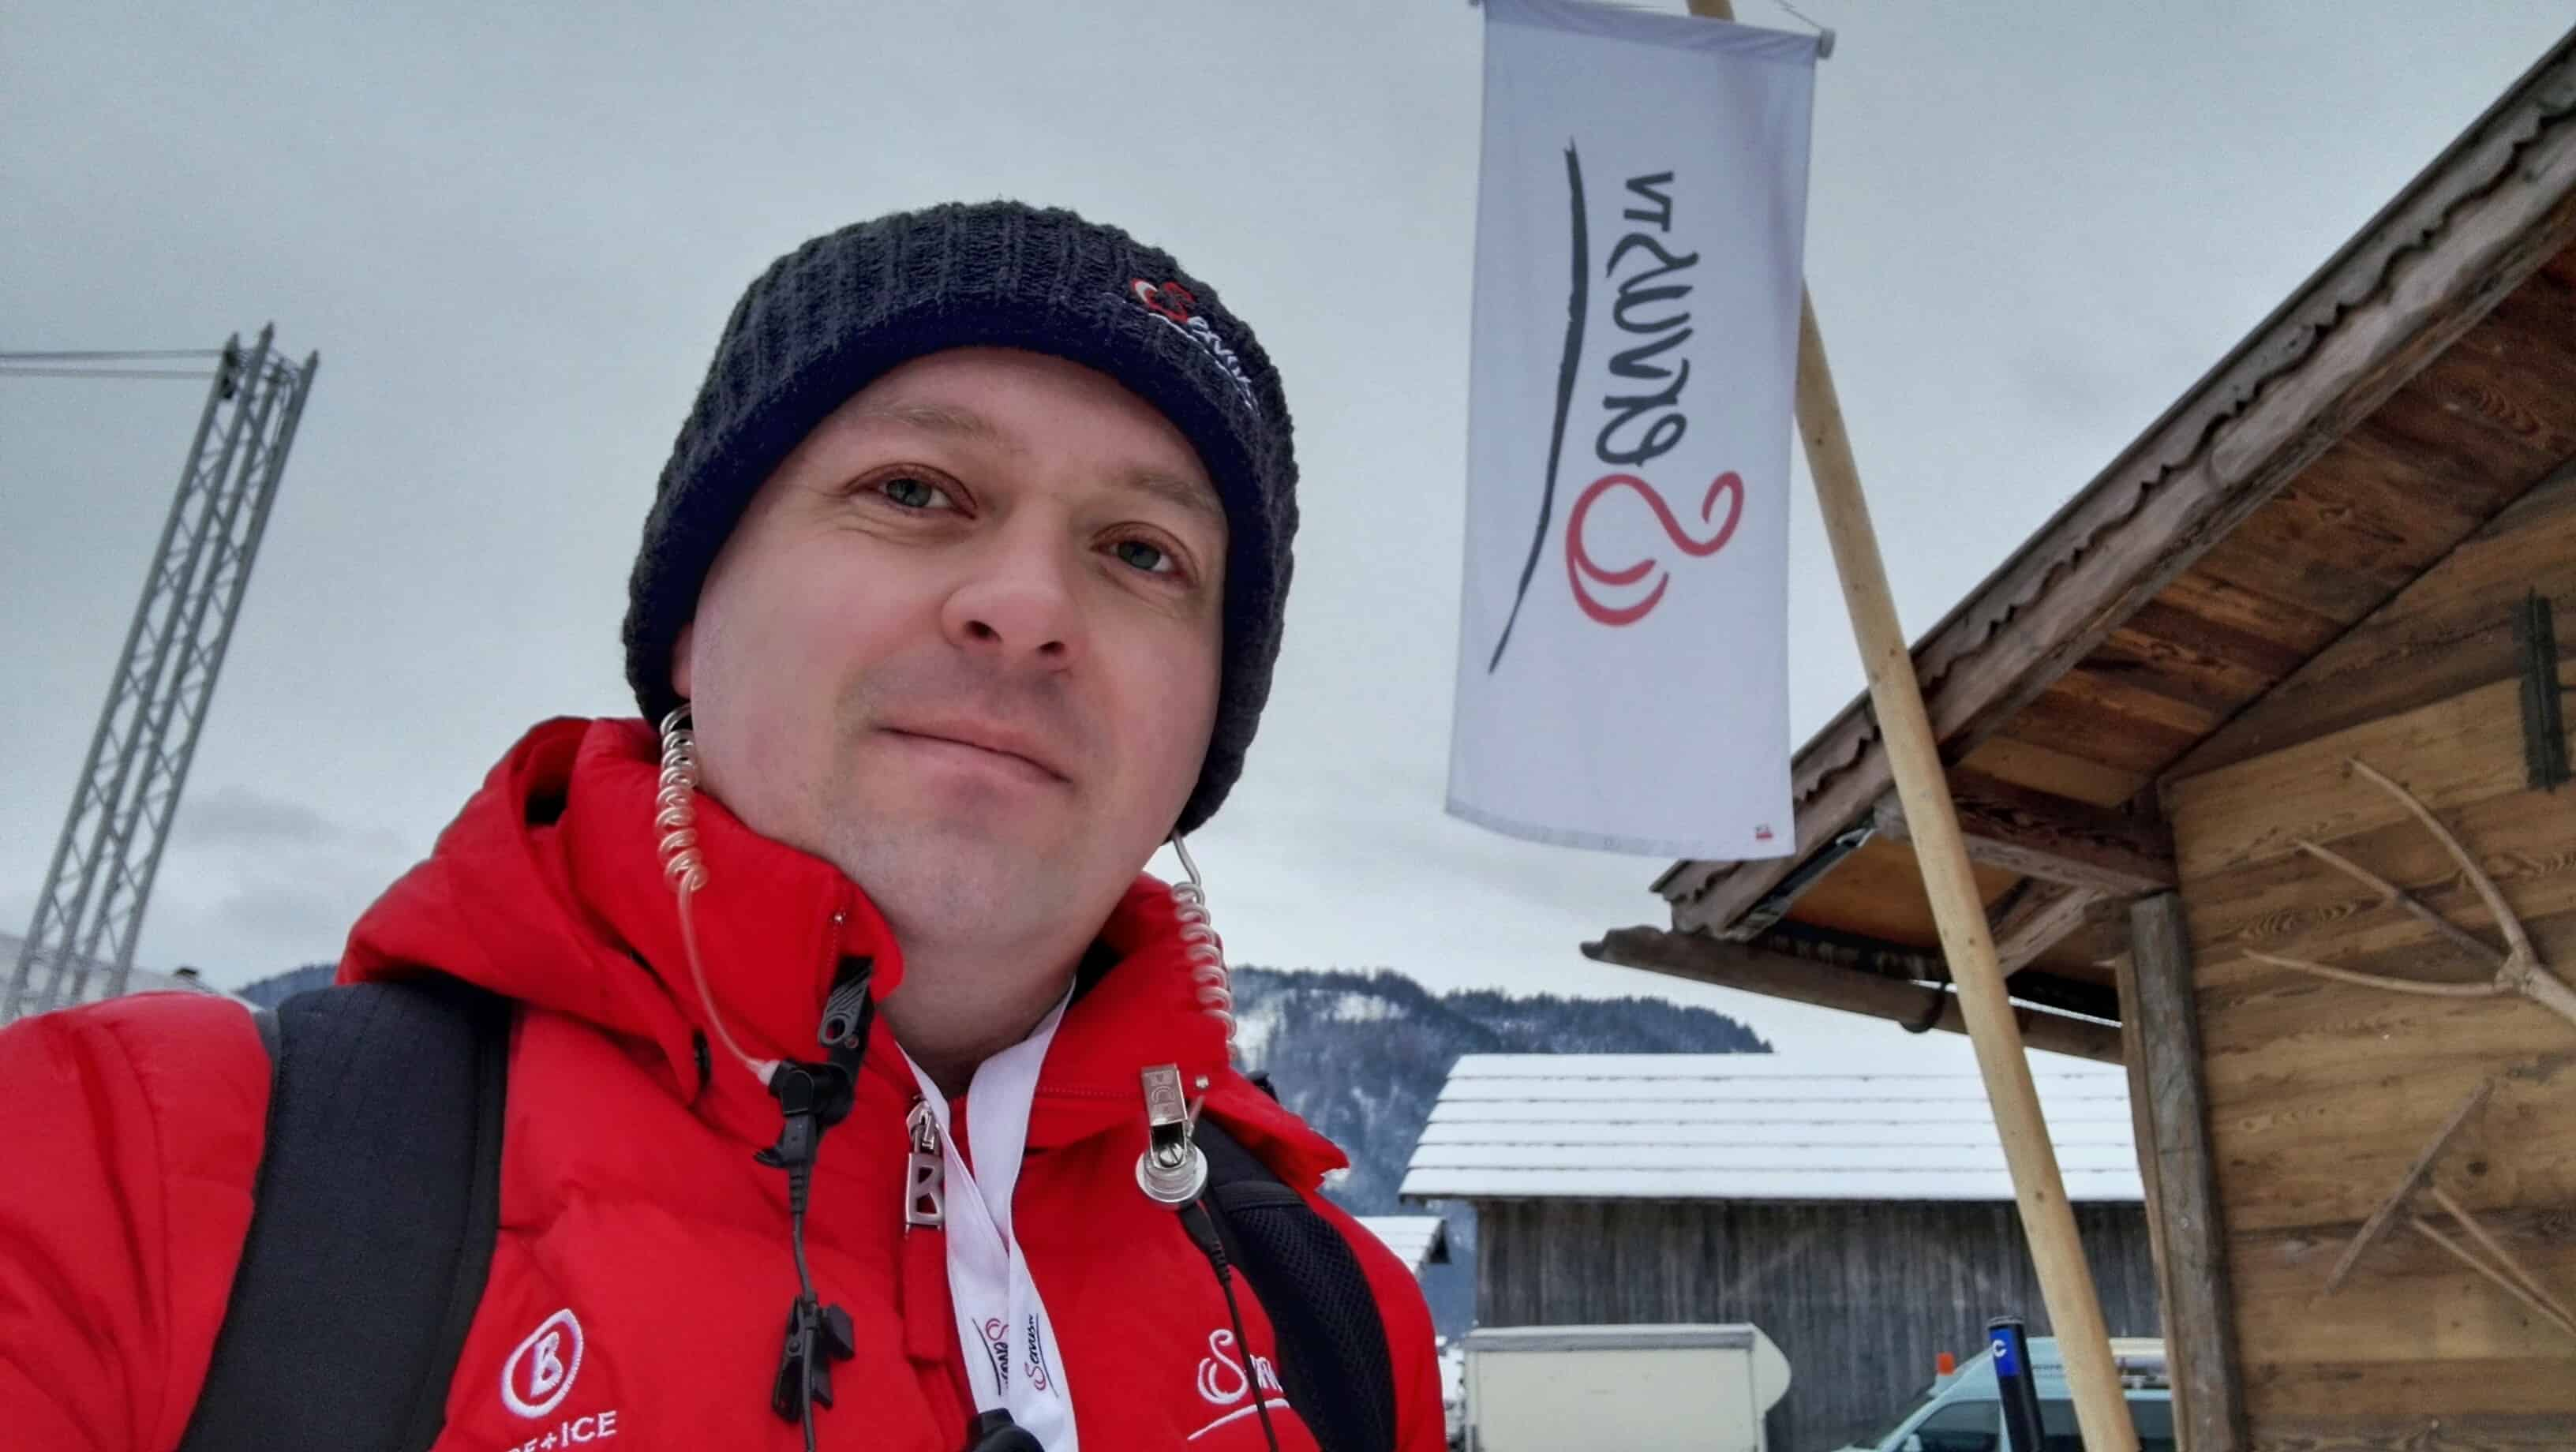 alpenpokal 12 - Servus Alpenpokal